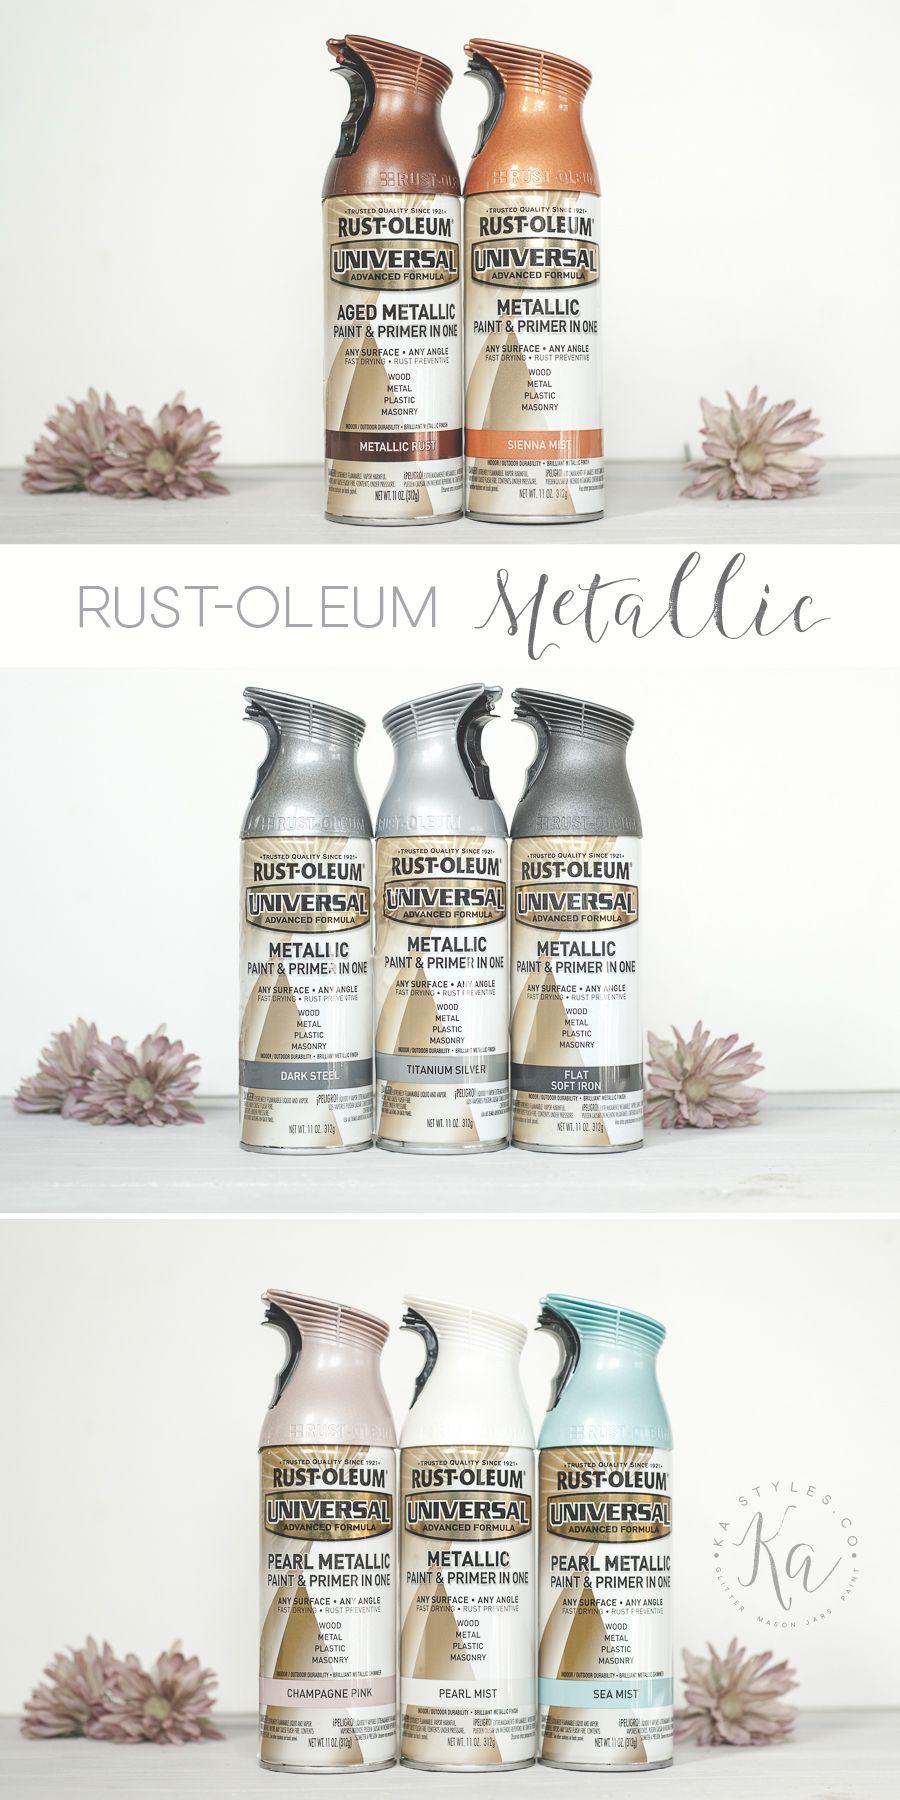 Rust Oleum Metallic Spray Paints Sprinkled And Painted At Ka Styles Co Metallic Spray Paint Metallic Spray Paint Colors Spray Paint Colors